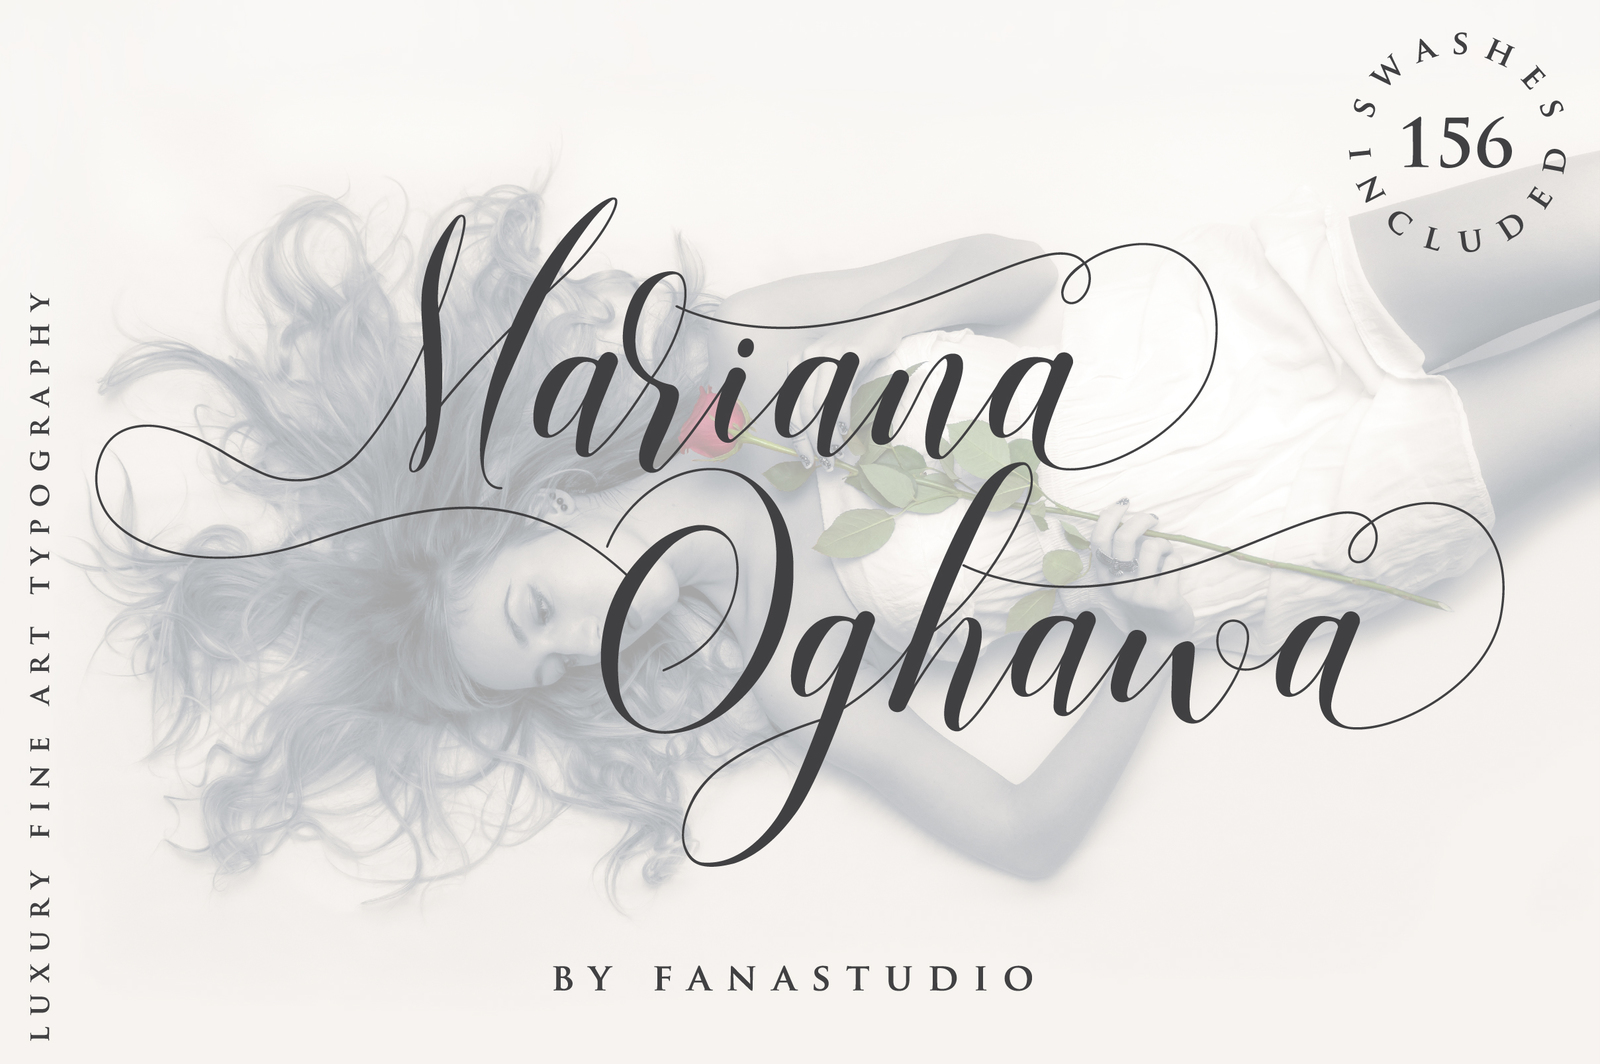 Mariana Oghawa